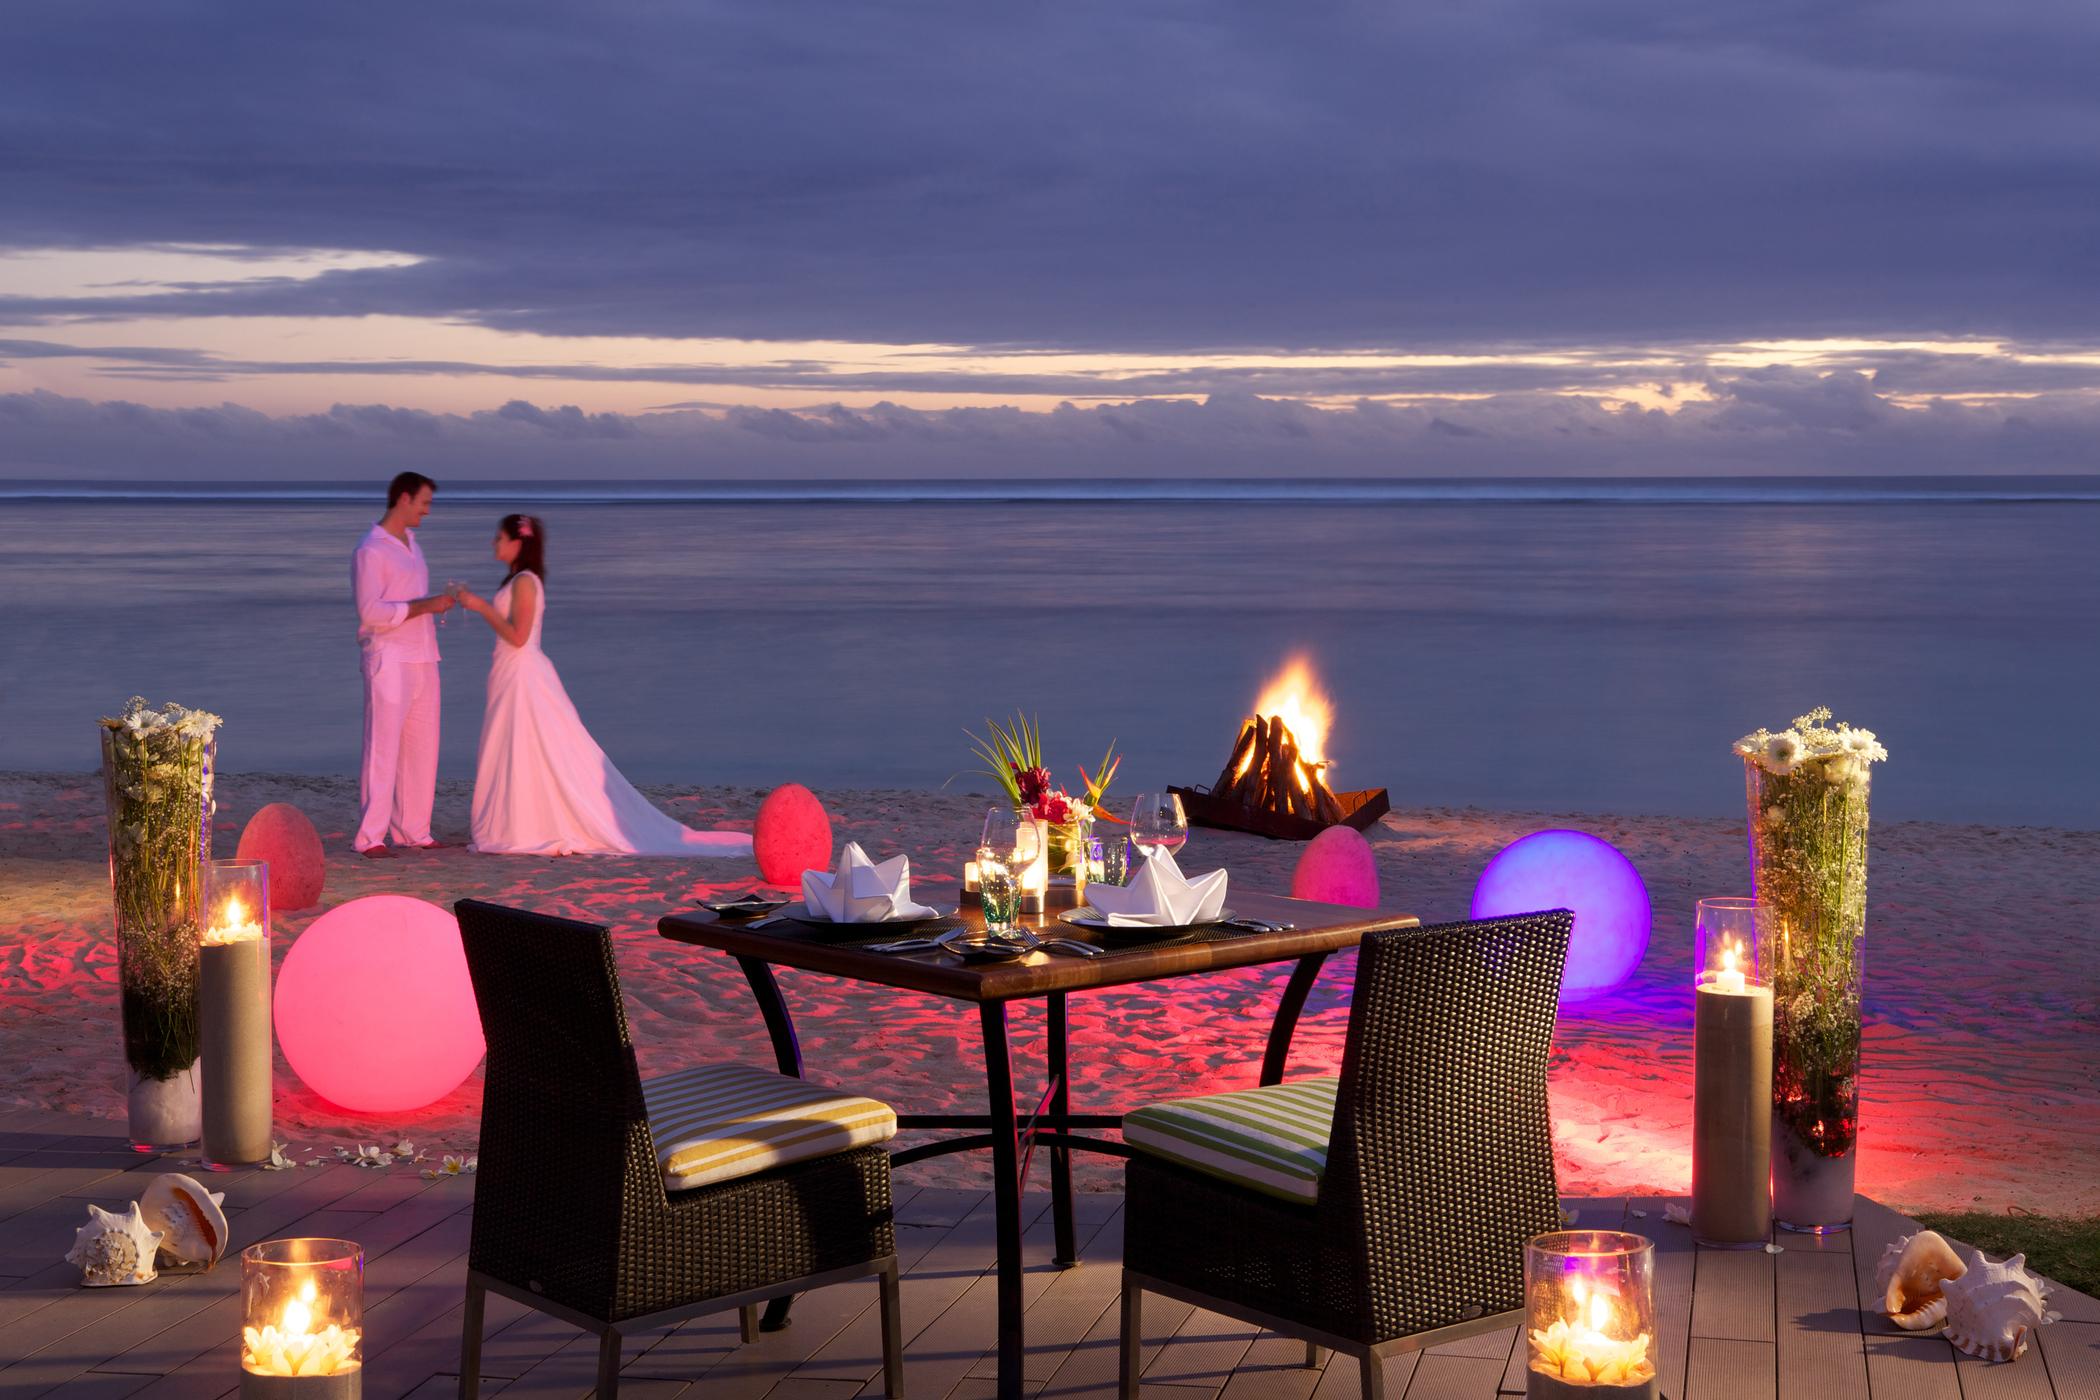 Romantic-Dinner-on-the-Beach-Sugar-Beach_2100x1400_300_RGB.jpg